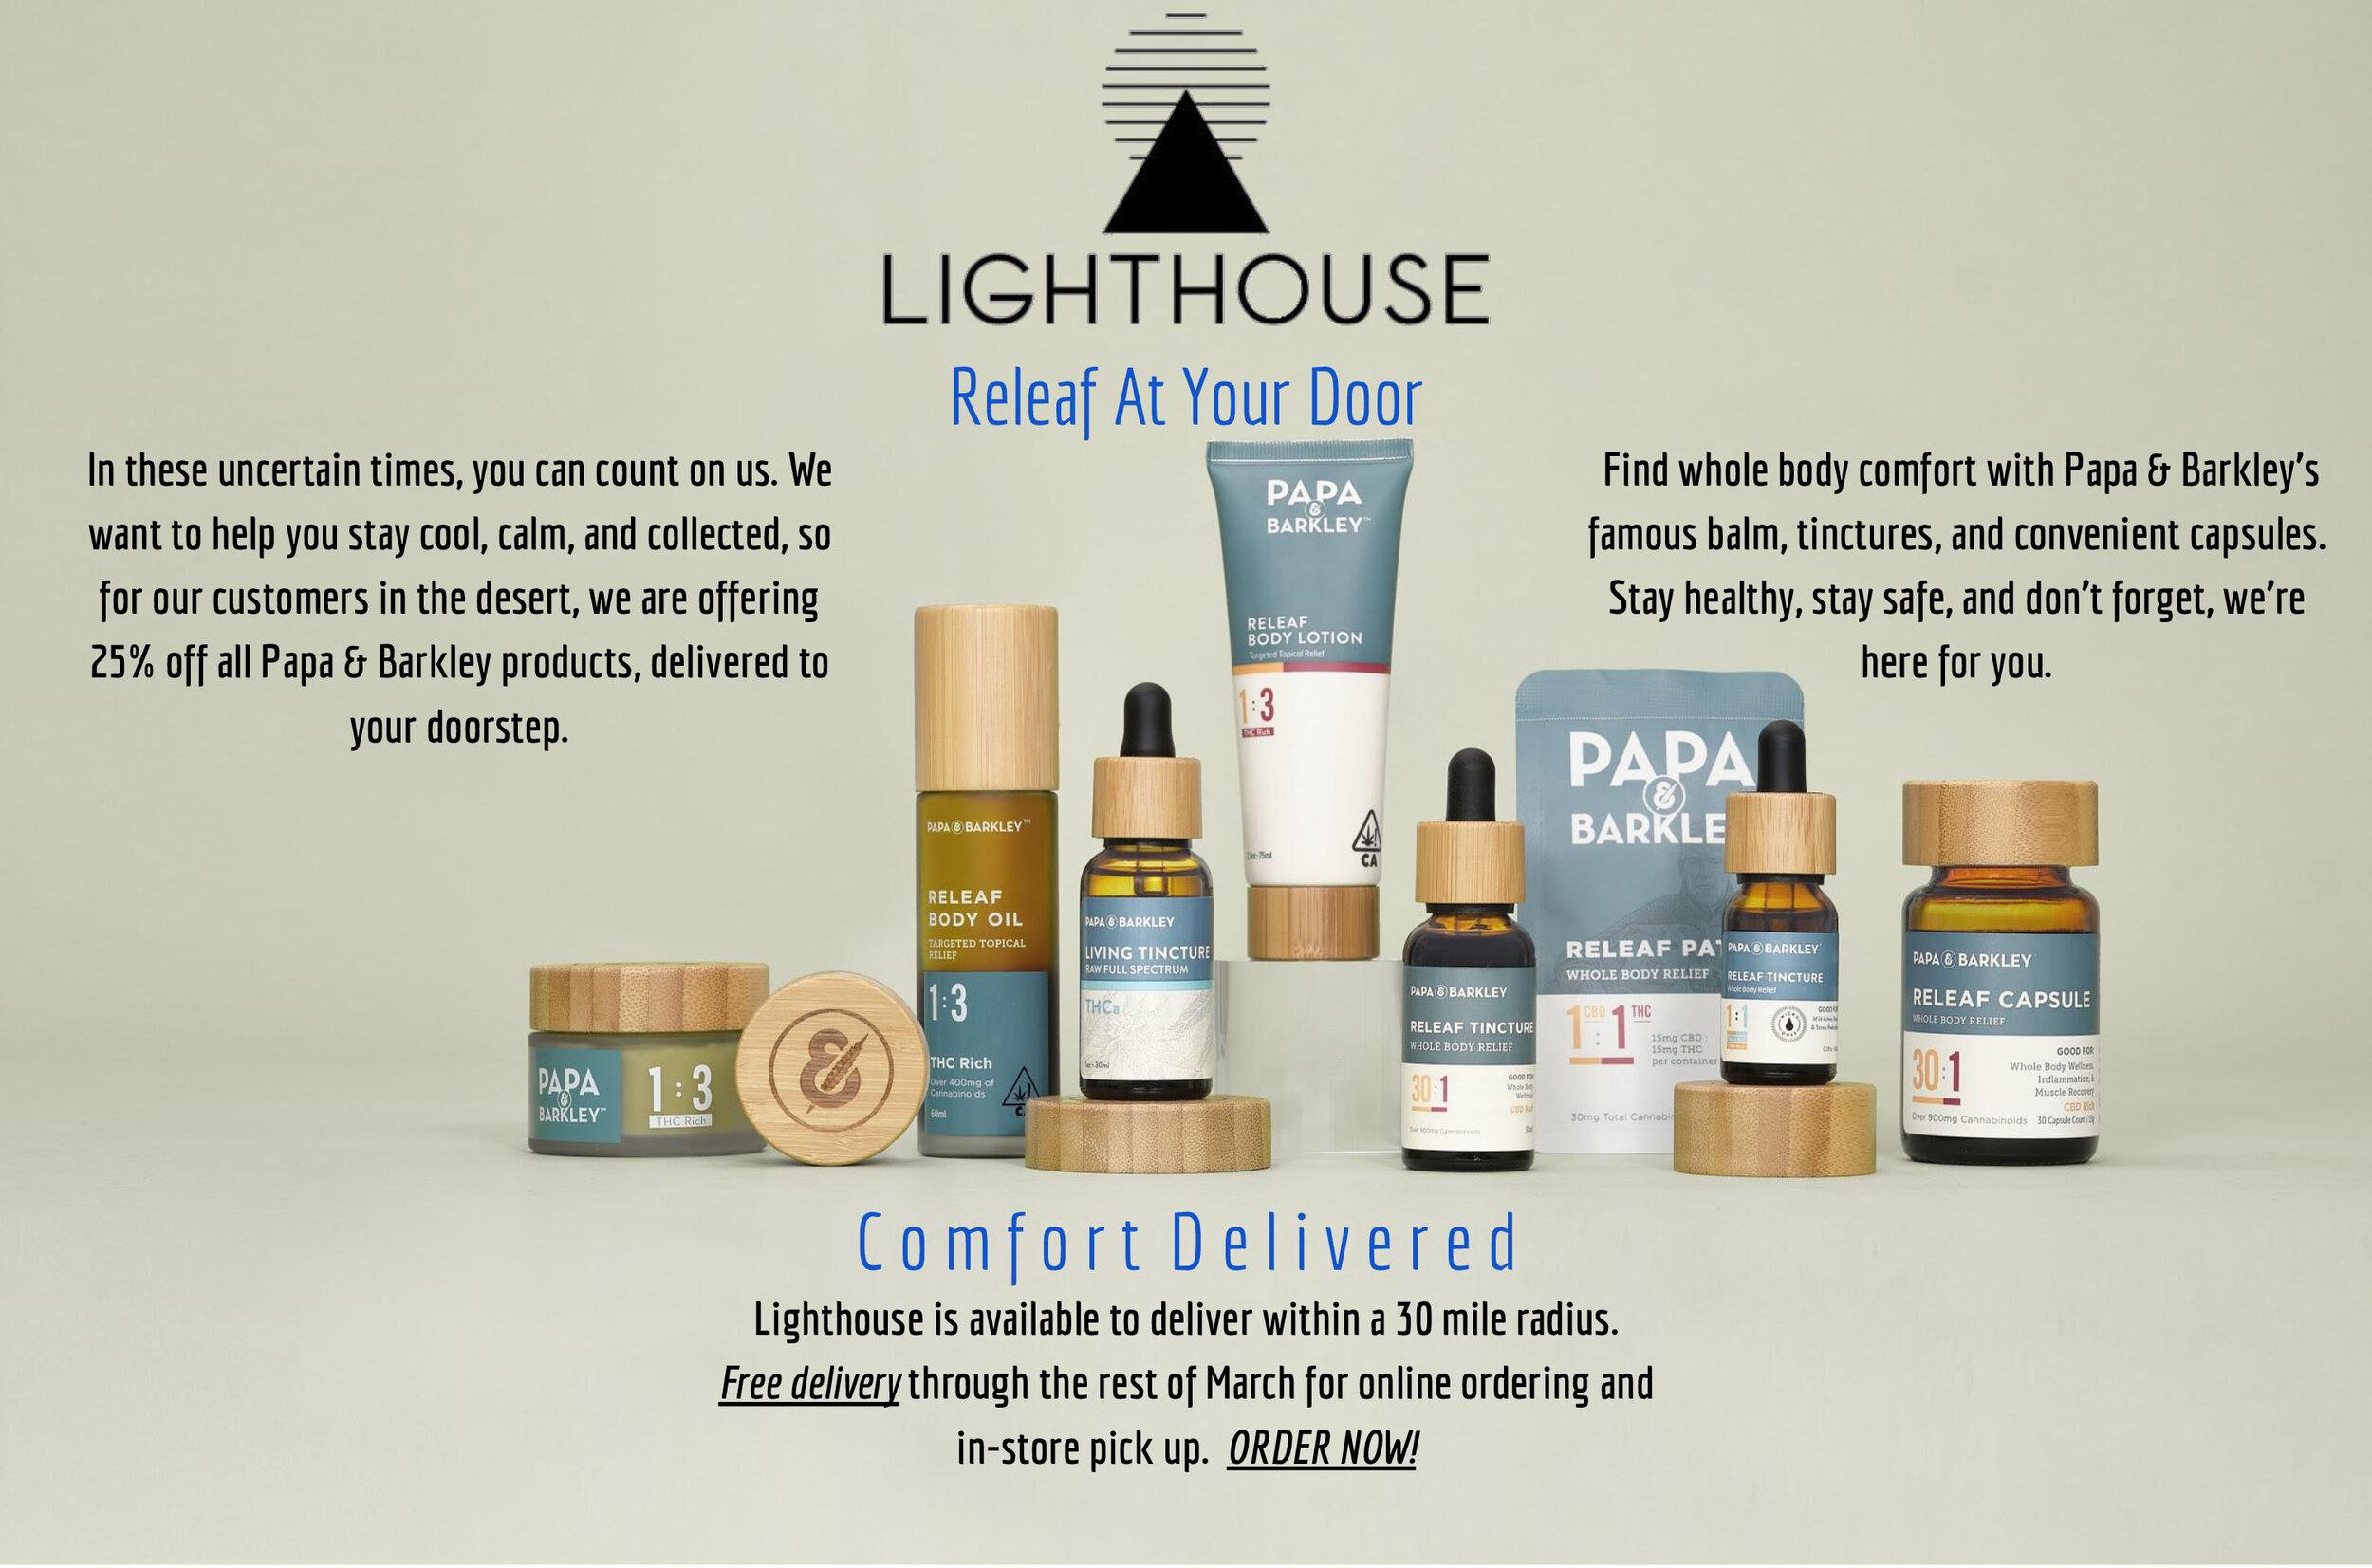 https://www.lighthousedispensary.com/wp-content/uploads/2020/05/PBFlierDraft.jpg